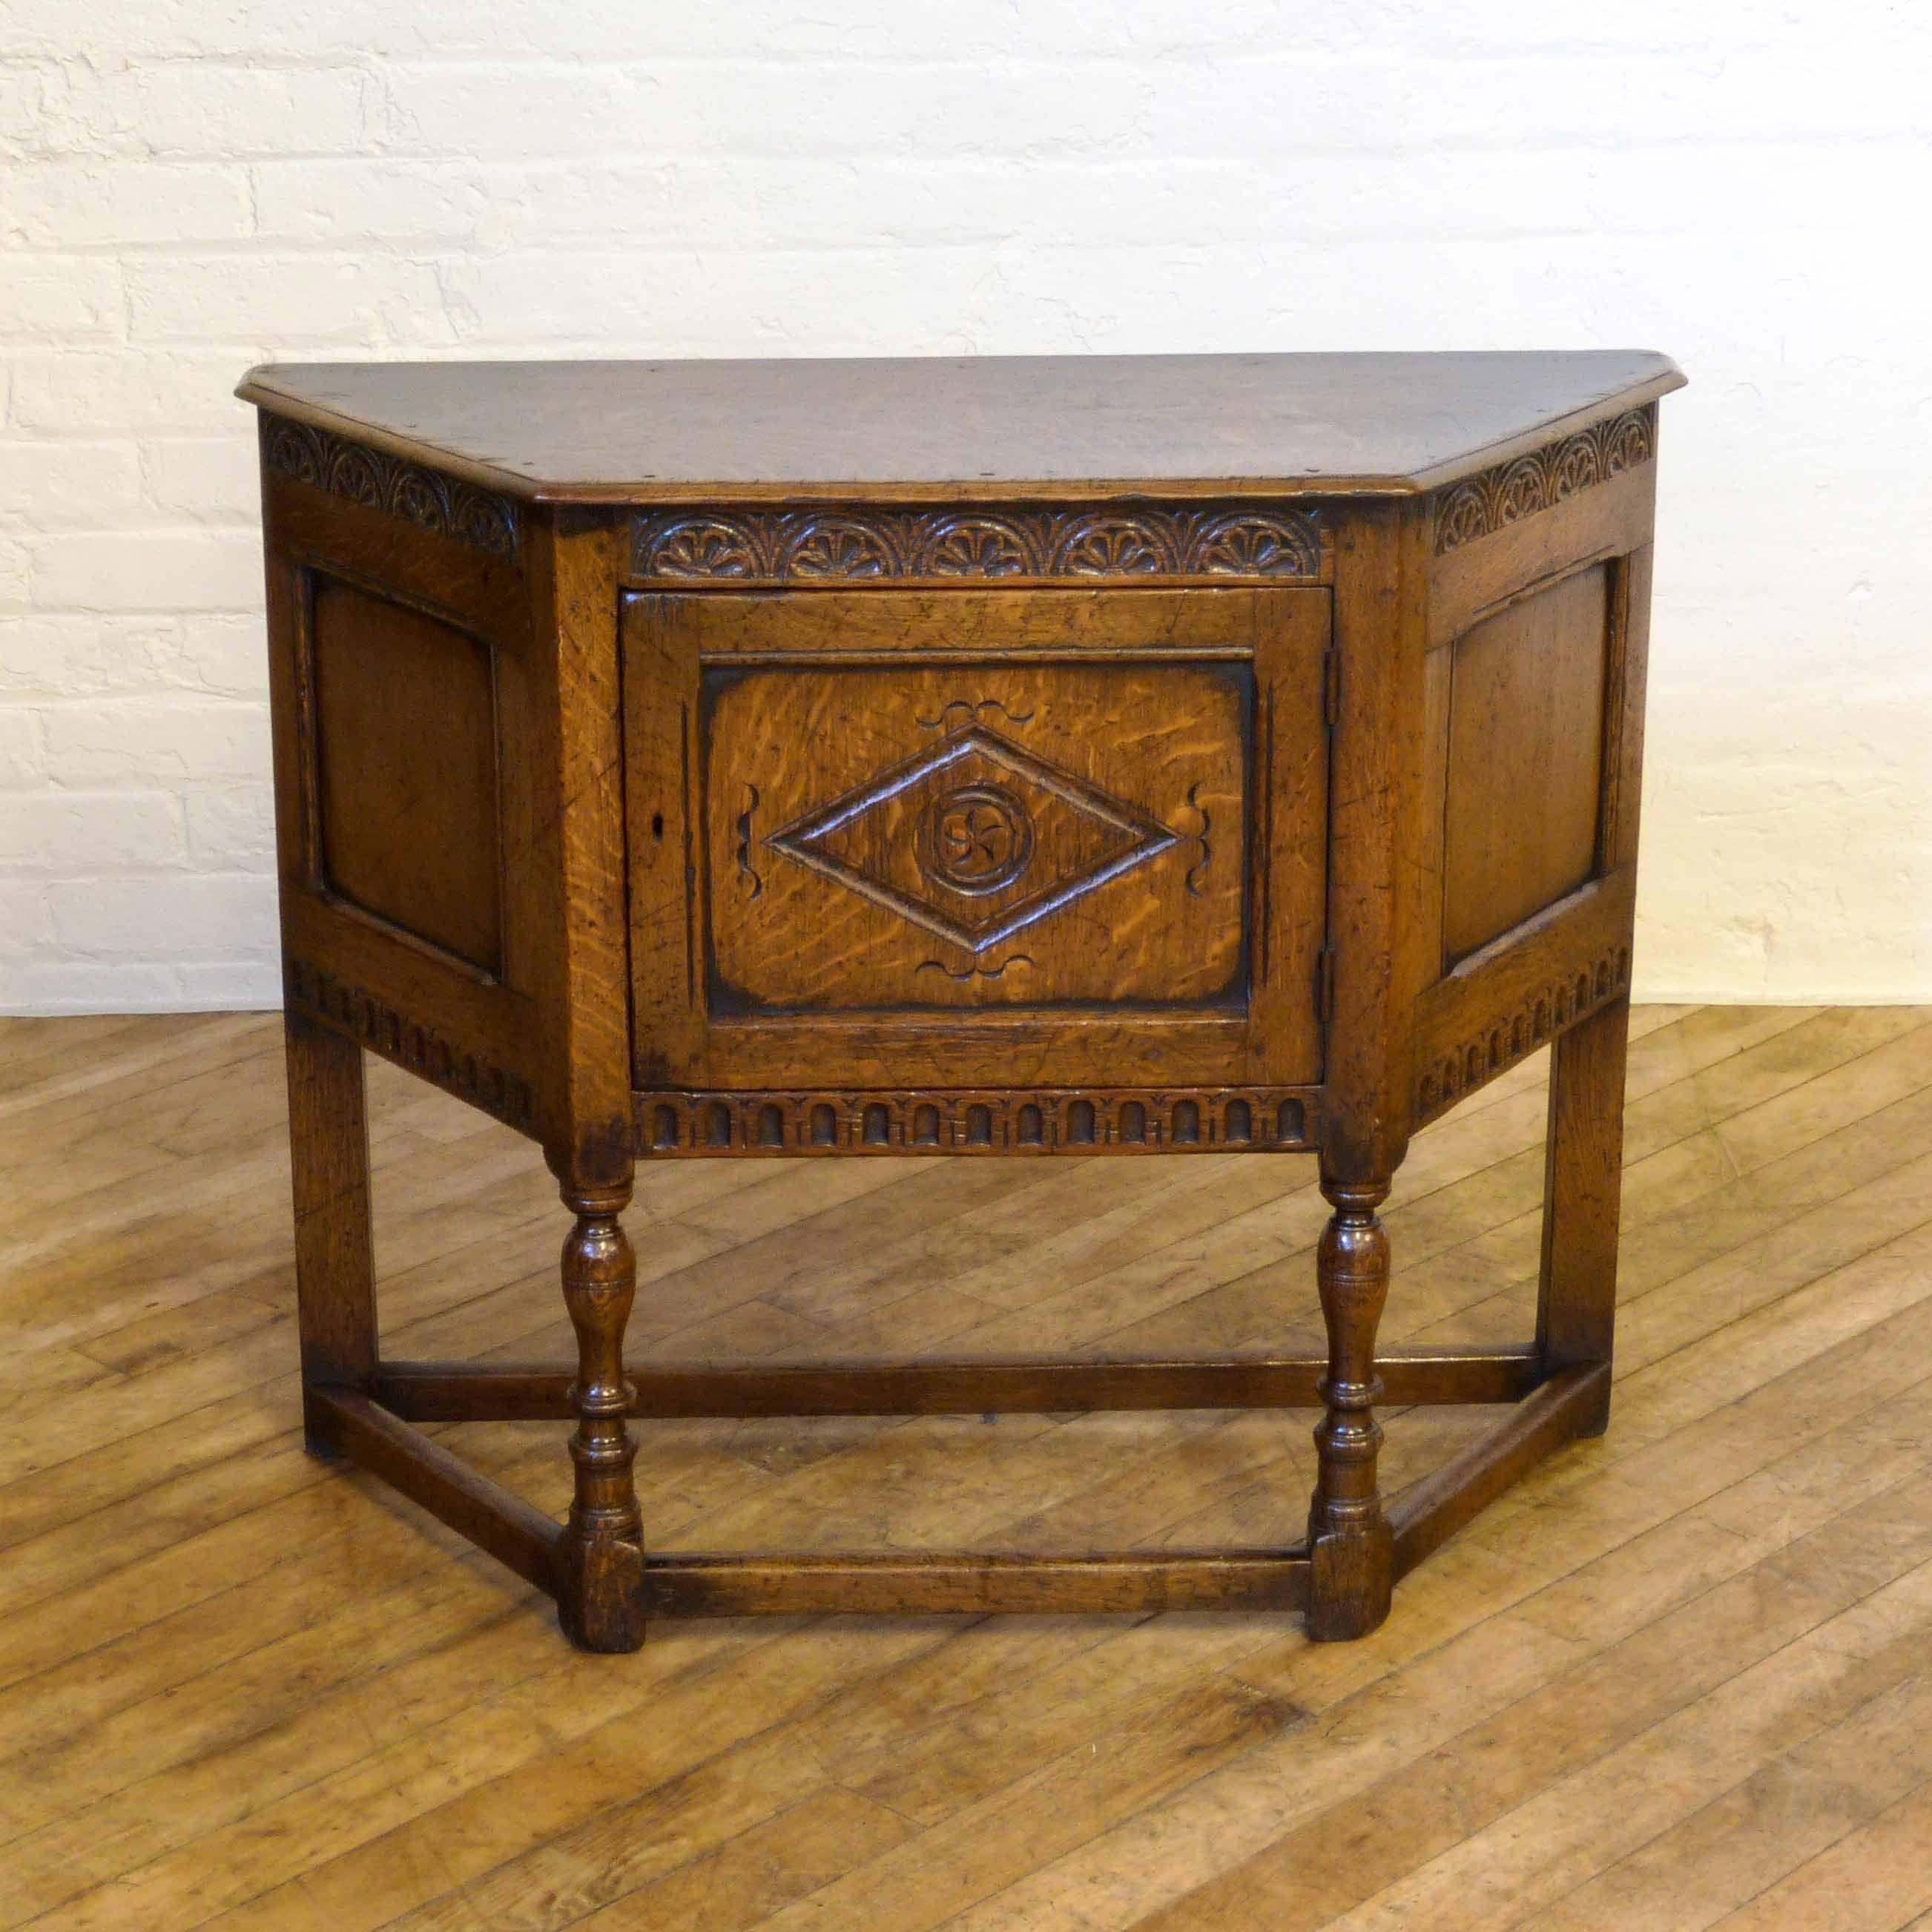 Victorian 17th Century Style Oak Credenze Table http://witchantiques.com/antique-victorian-17th-century-style-oak-credenze-table.html